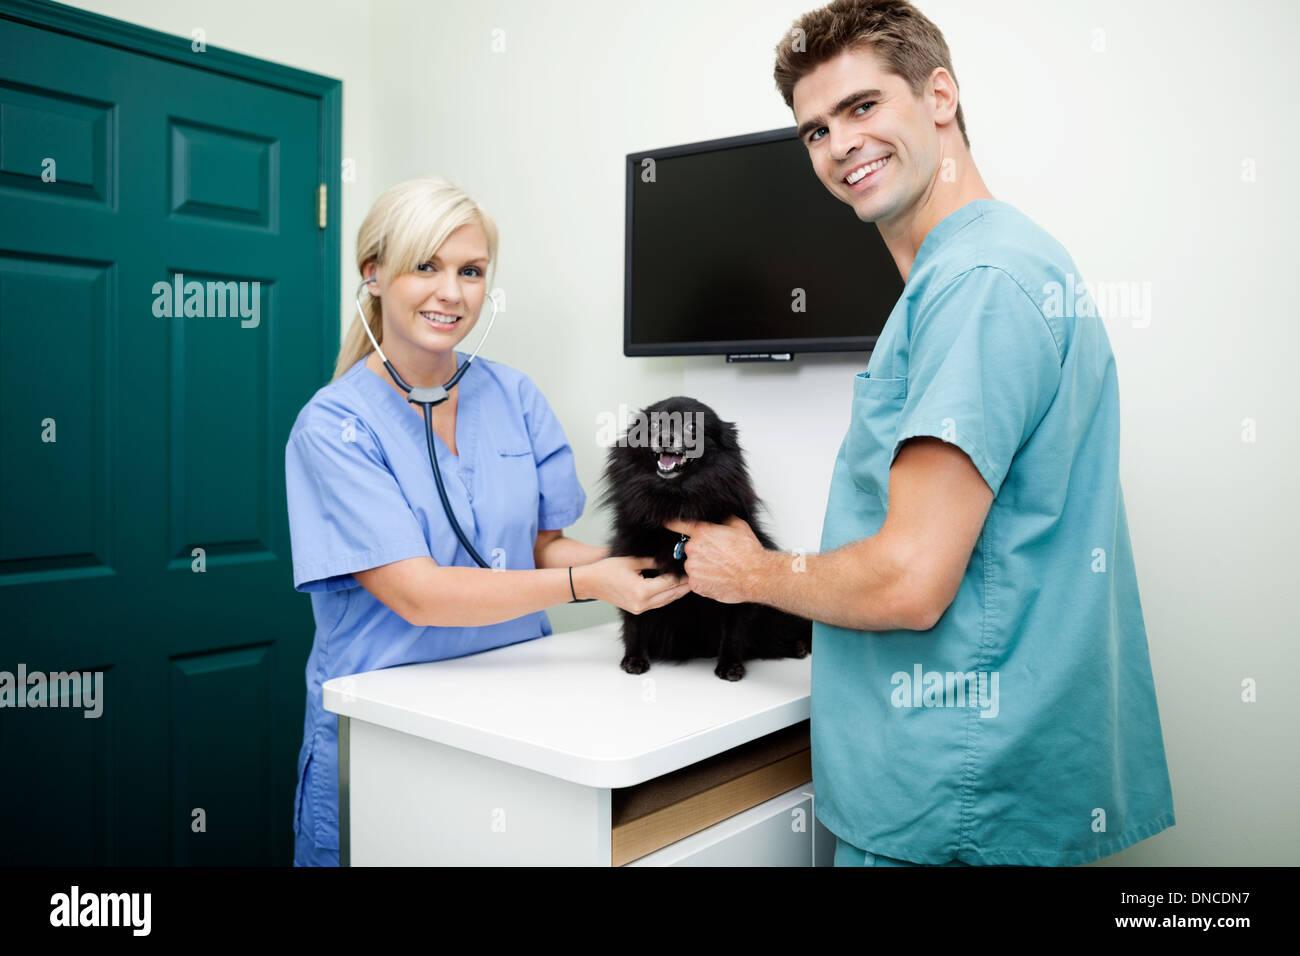 Young Veterinarian Doctors Examining A Dog - Stock Image